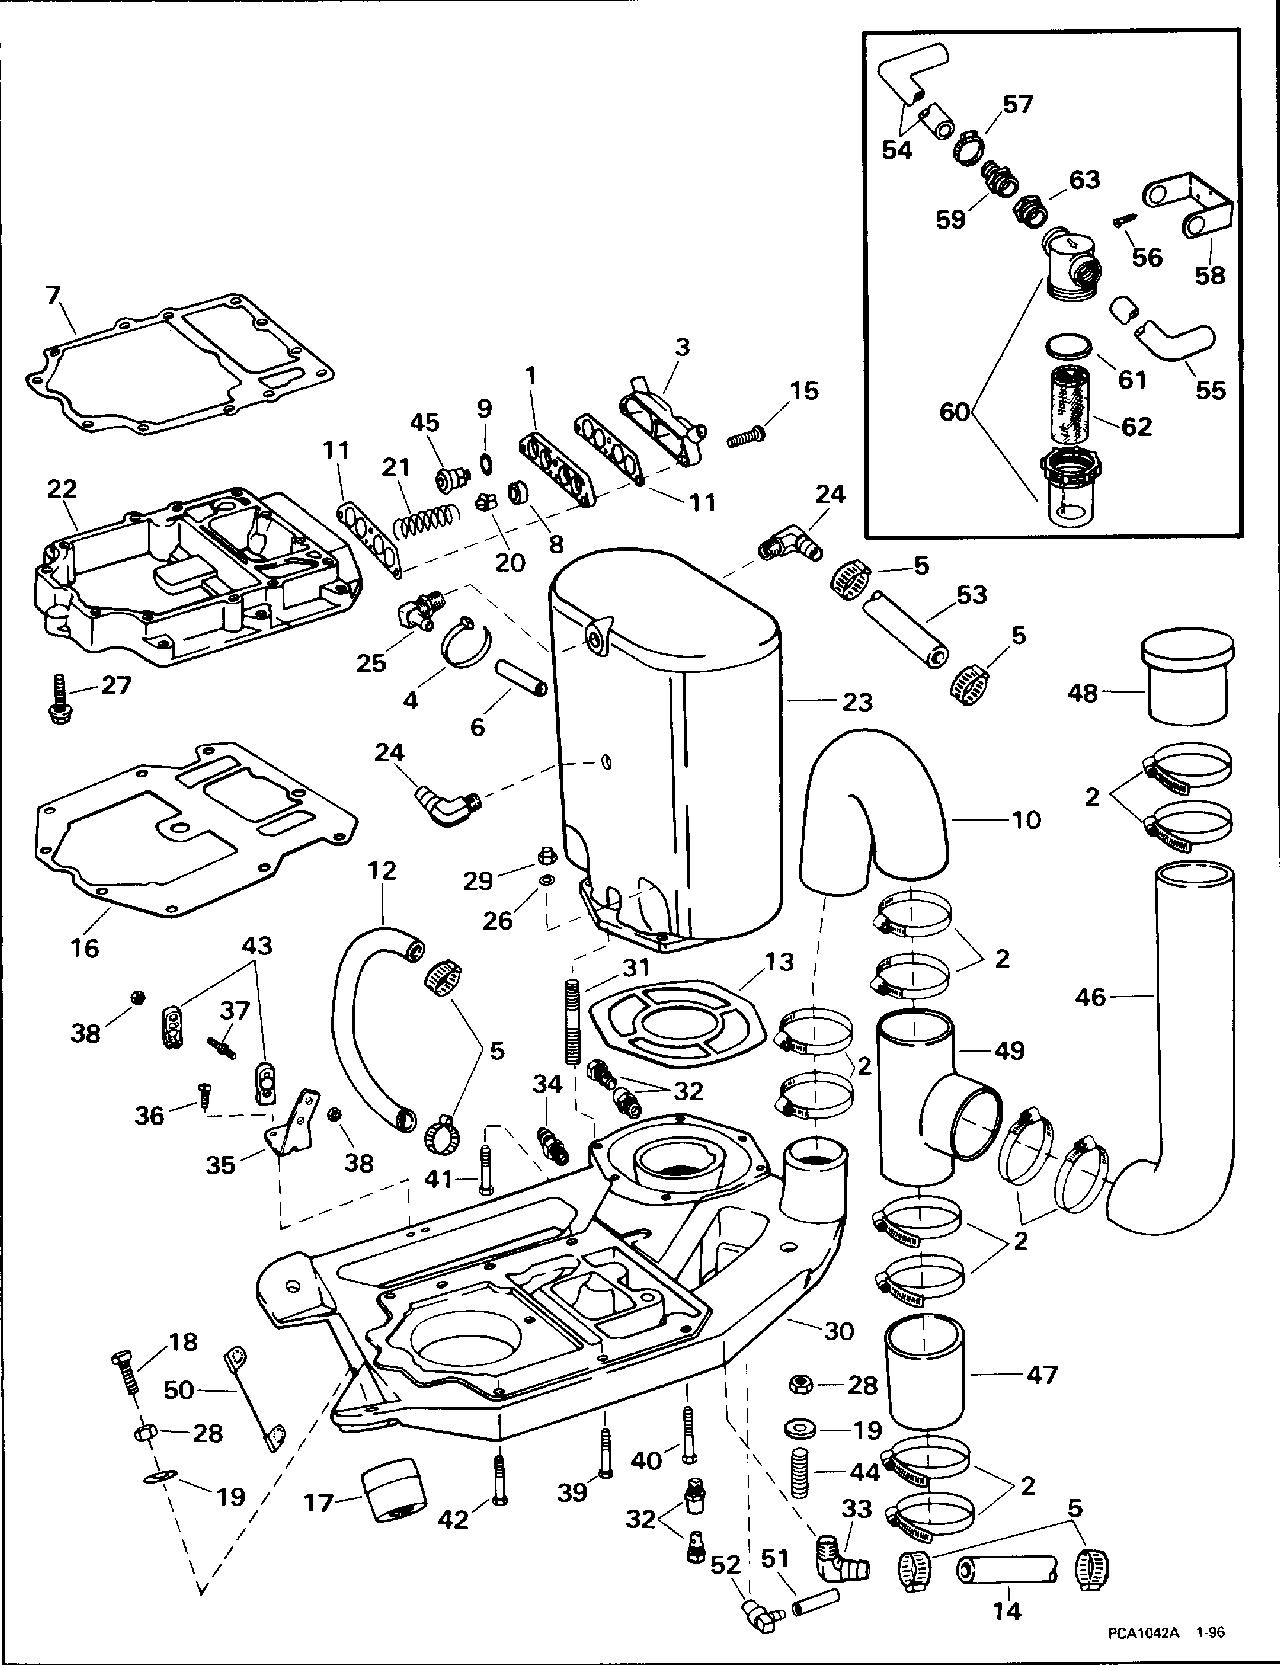 [ANLQ_8698]  BRP | TURBOJET | 1996 | 115 | 115TJEDB 1996 | ADAPTER & MUFFLER - Evinrude /Johnson/OMC outboard motor parts - Van's Sport Center | Wiring Diagram Omc 115 Turbojet |  | Van's Sport Center